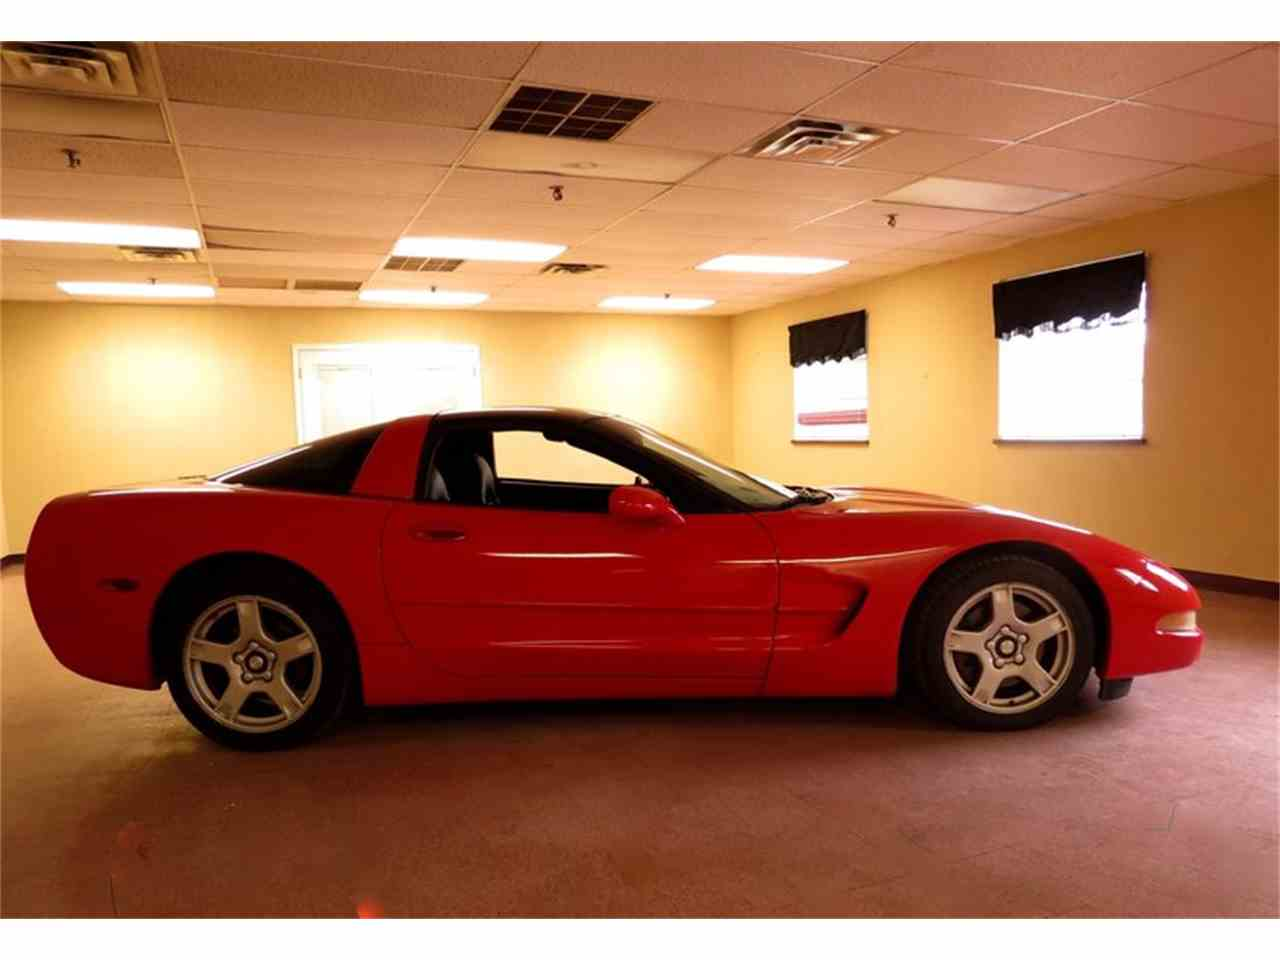 Large Picture of 1998 Corvette located in Ohio - $12,000.00 - FHW7